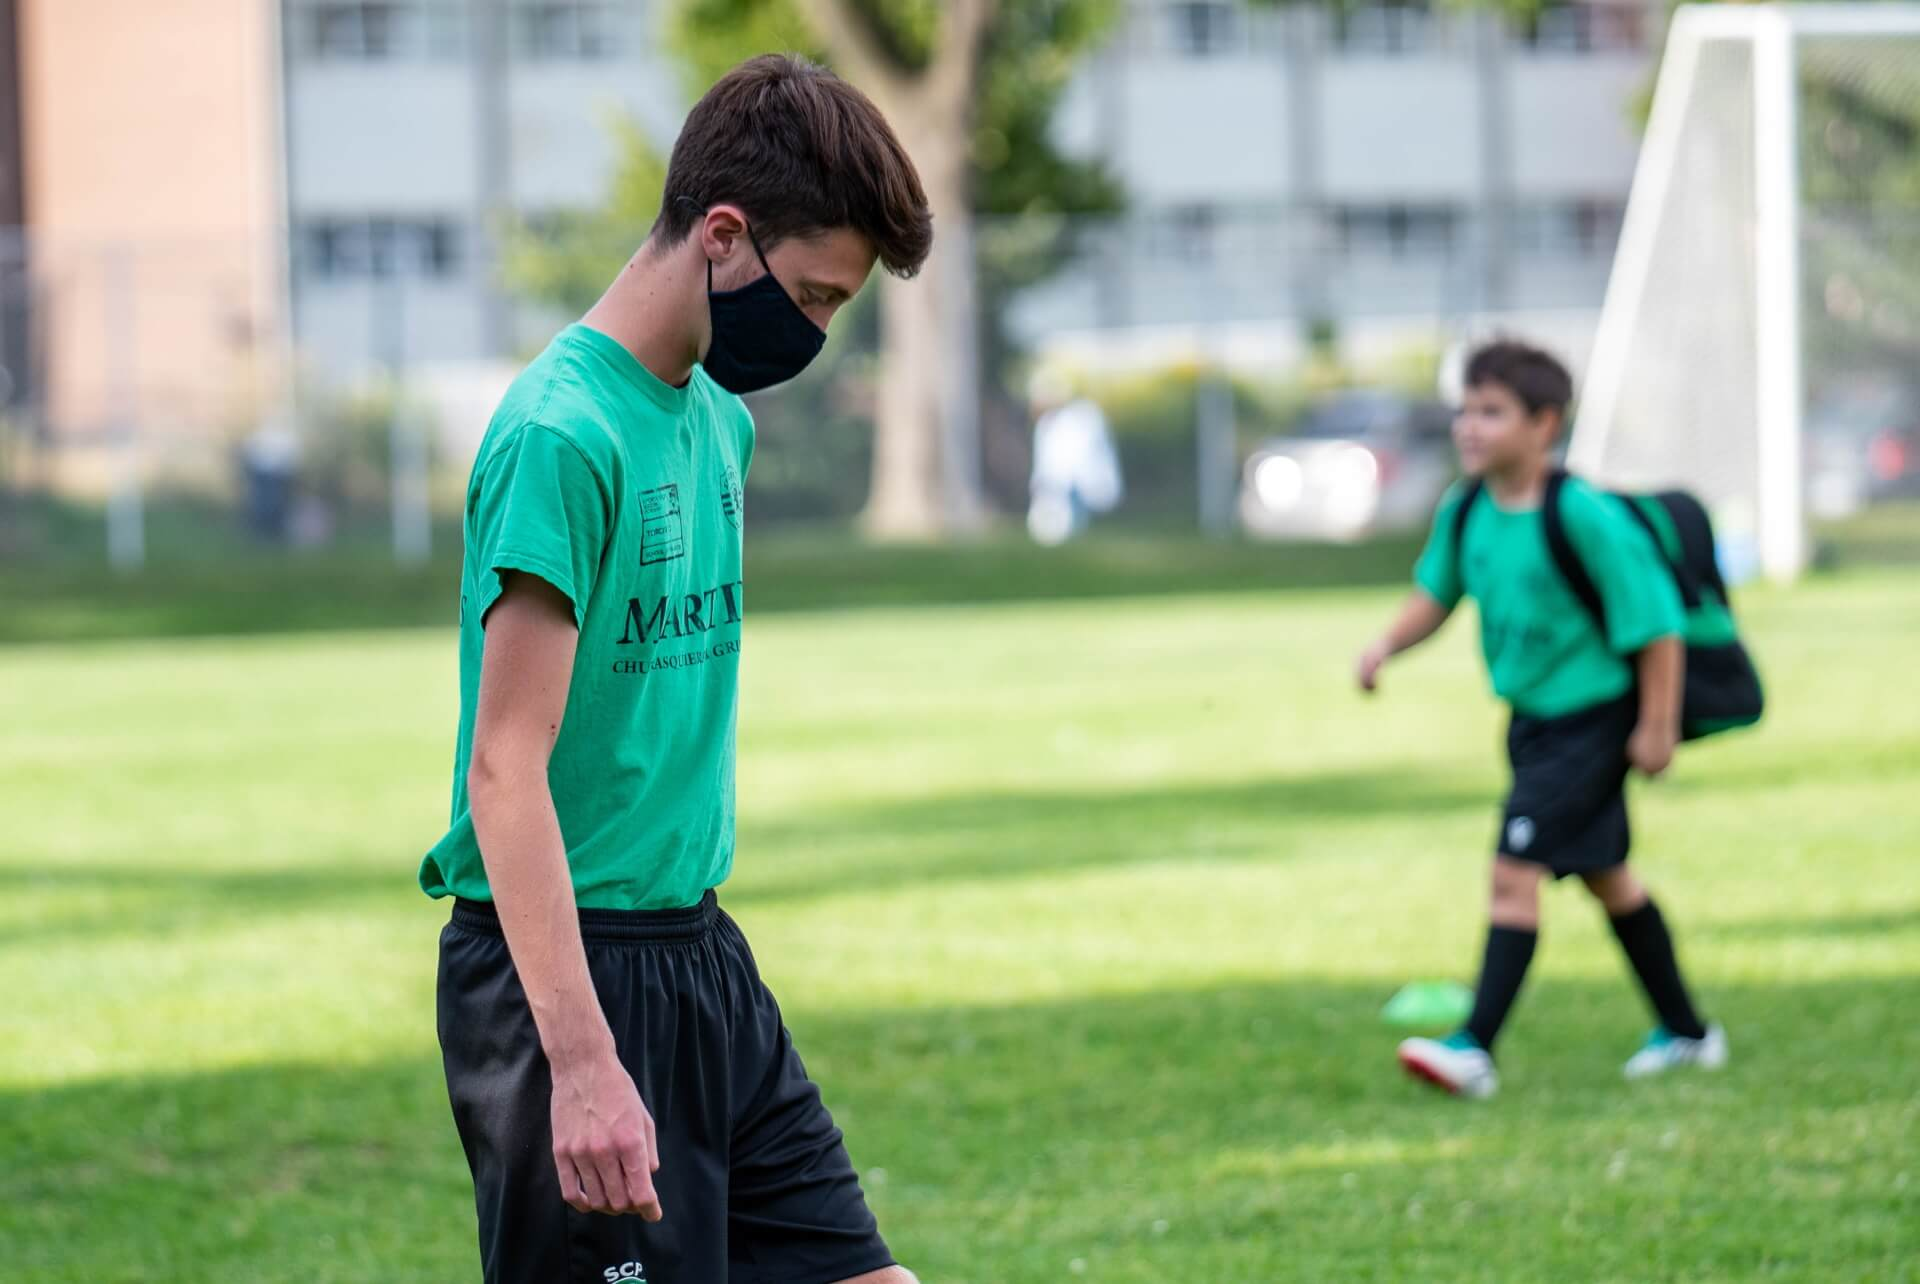 Sporting FC Toronto - return protocol